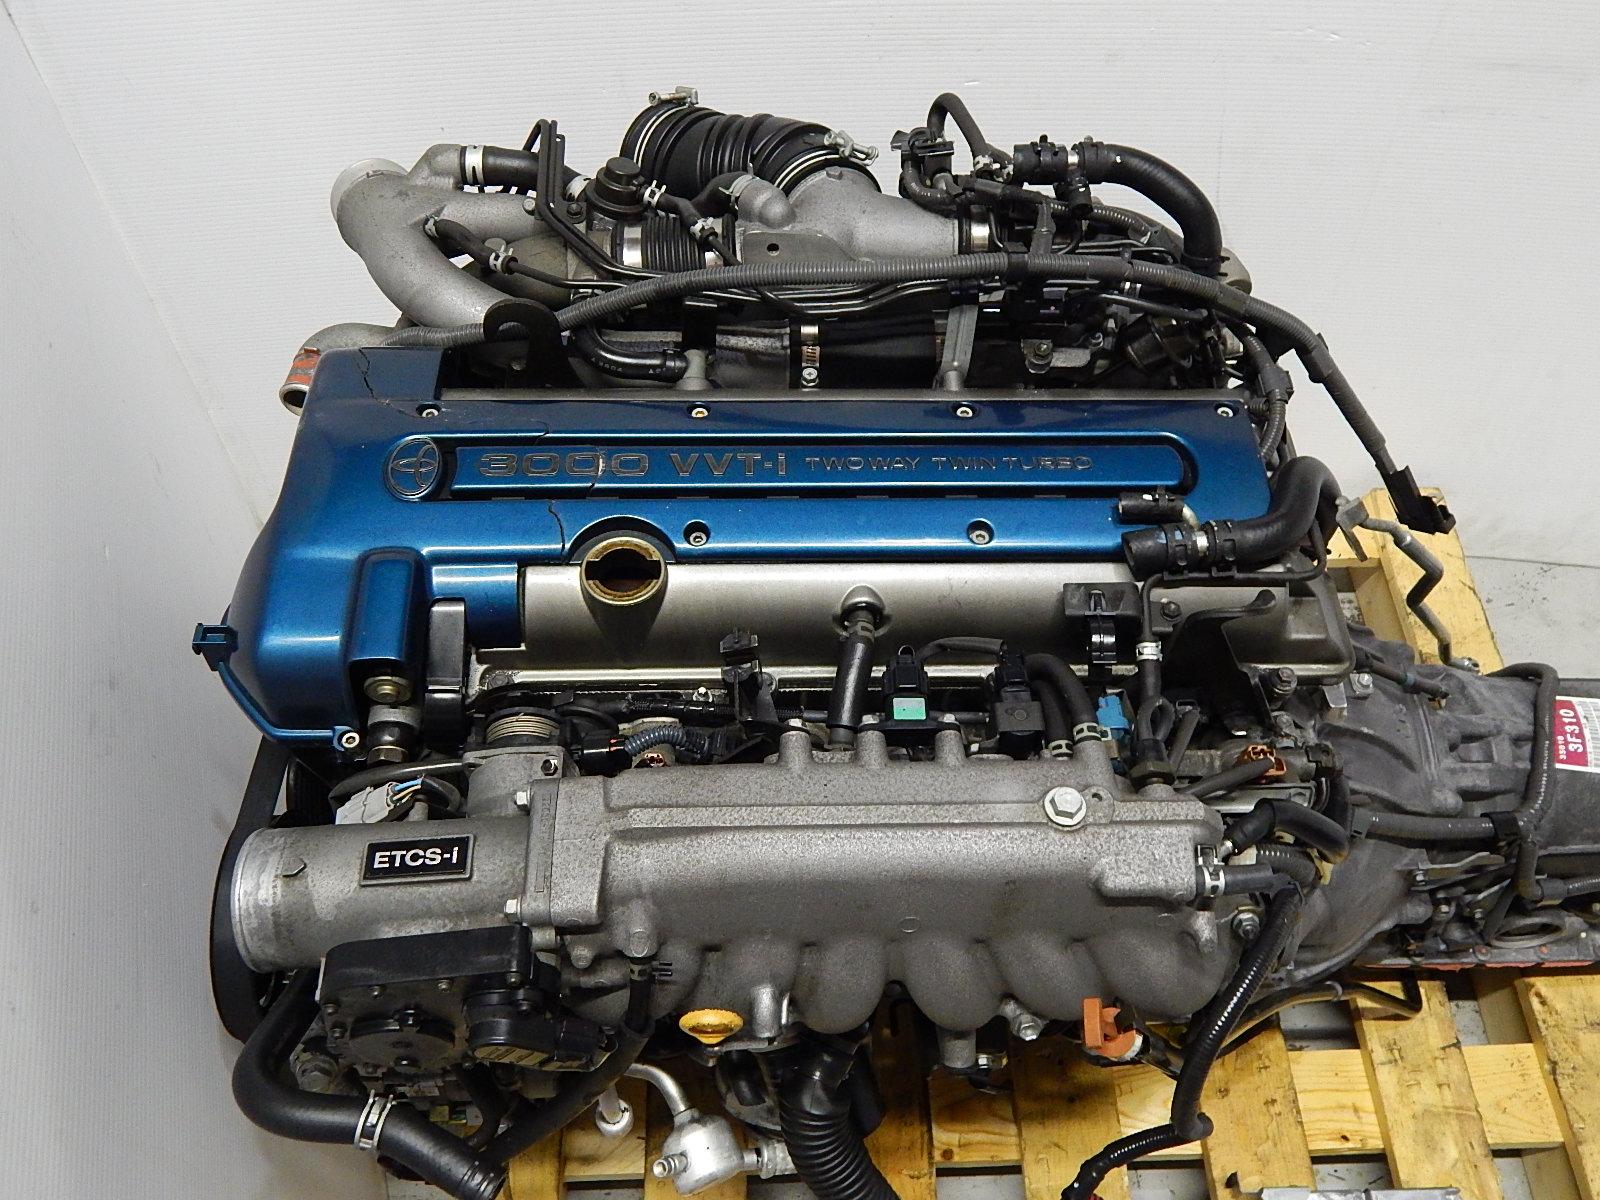 Wiring Diagram Toyota 1jz Gte Vvti Engine Sensor Wire Auto Transmission Best Image 2018